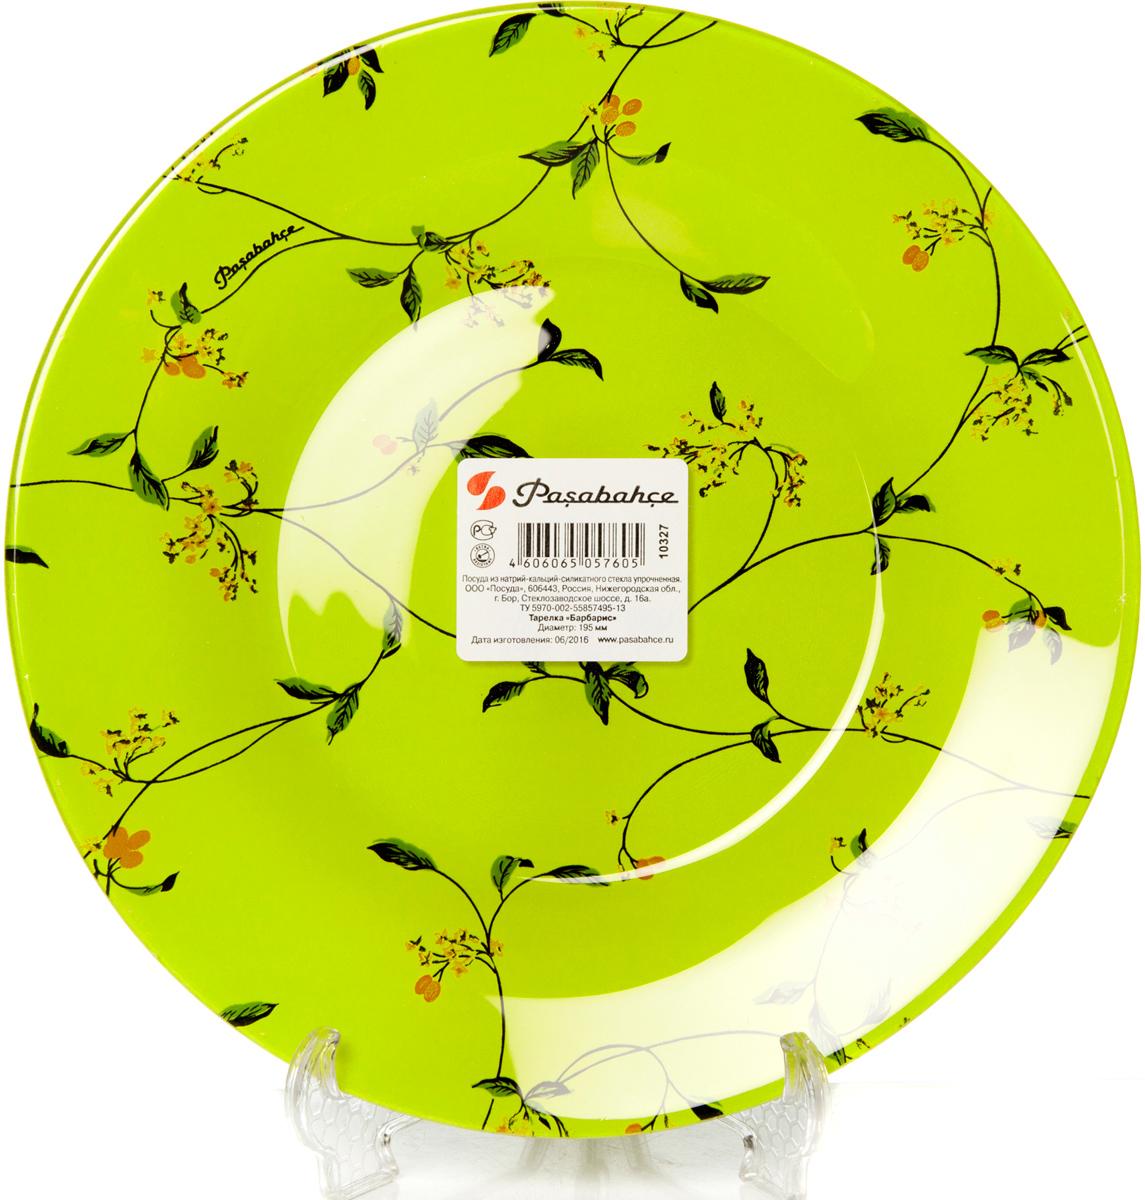 Тарелка Pasabahce Барбарис, цвет: салатовый, диаметр 19,5 см10327SLBD32Тарелка из упроч.стекла d=195 мм, рис. Барбарис